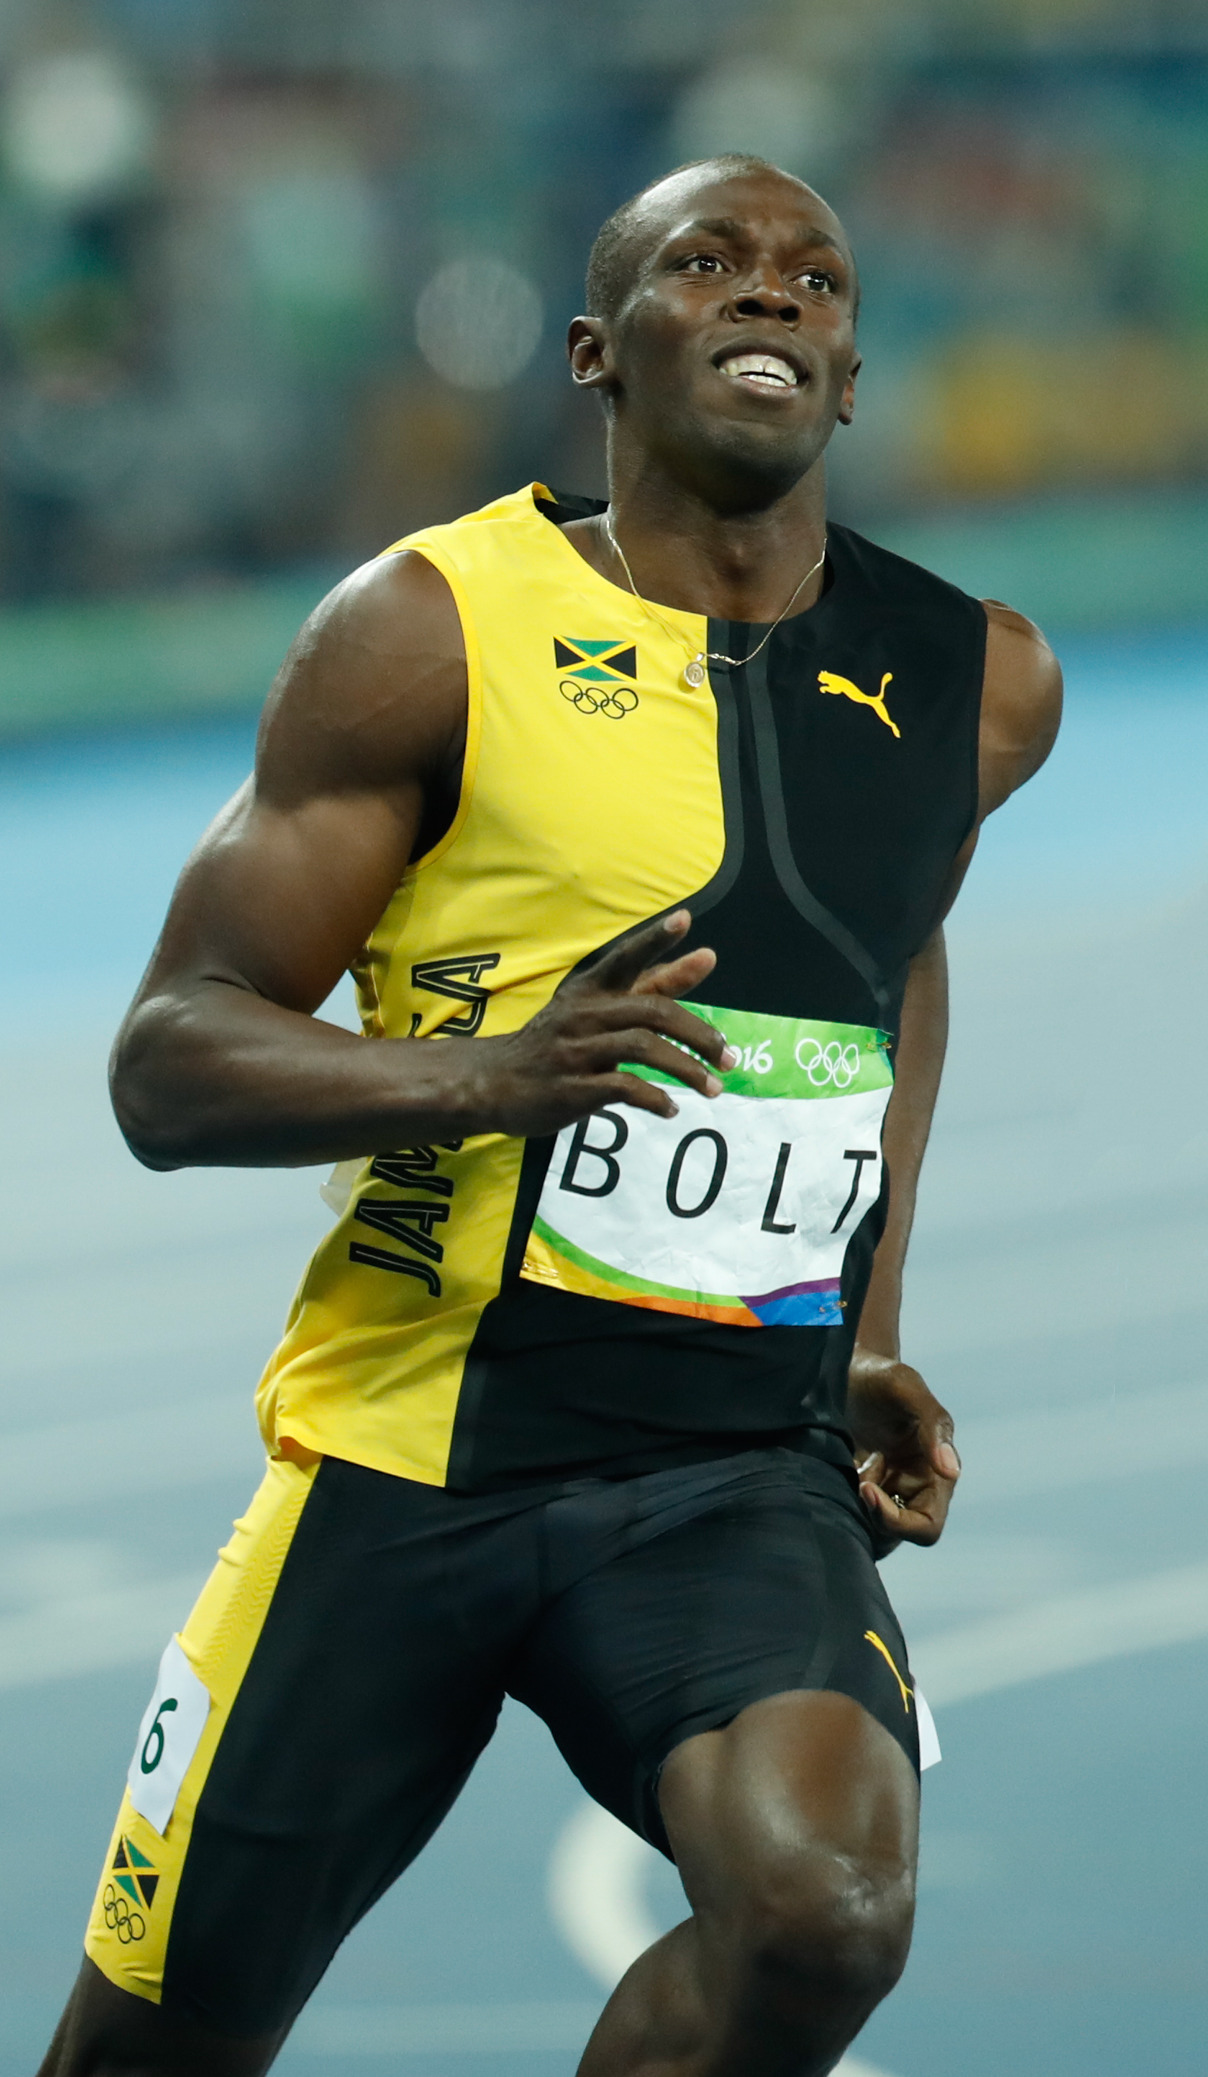 Usain Bolt, positivo por coronavirus tras celebrar su fiesta de cumpleaños | La